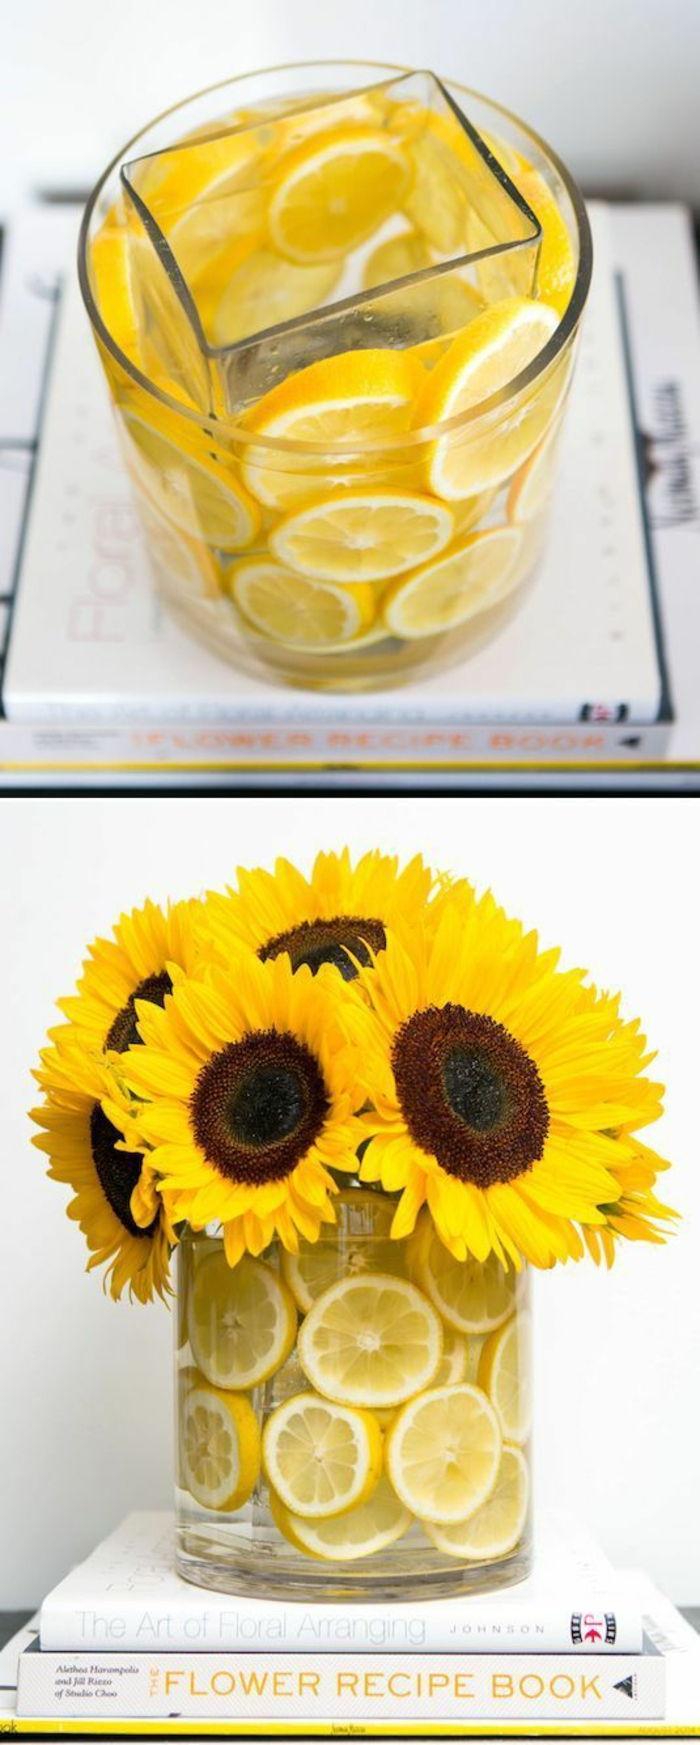 bastelideen fr C3 BChling sonnenblumen vasen zitronen zitronenschale b C3 BCcher